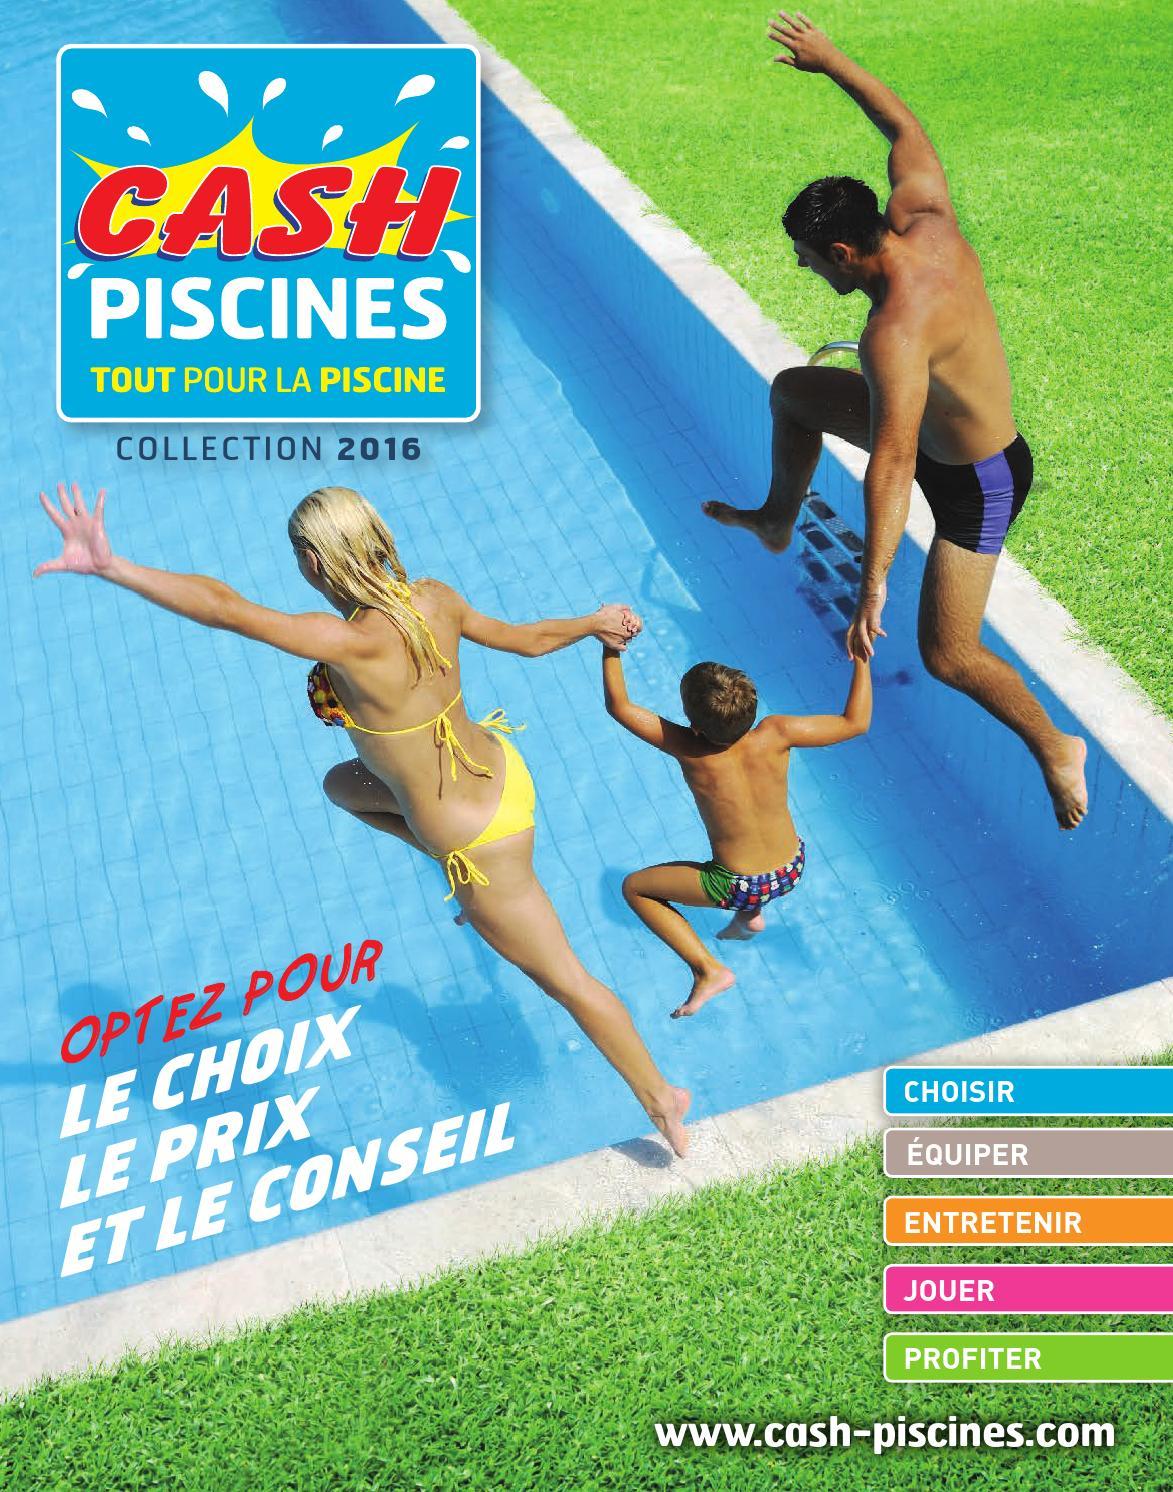 Cash Piscines 2016 By Octave Octave - Issuu à Cash Piscine Marmande